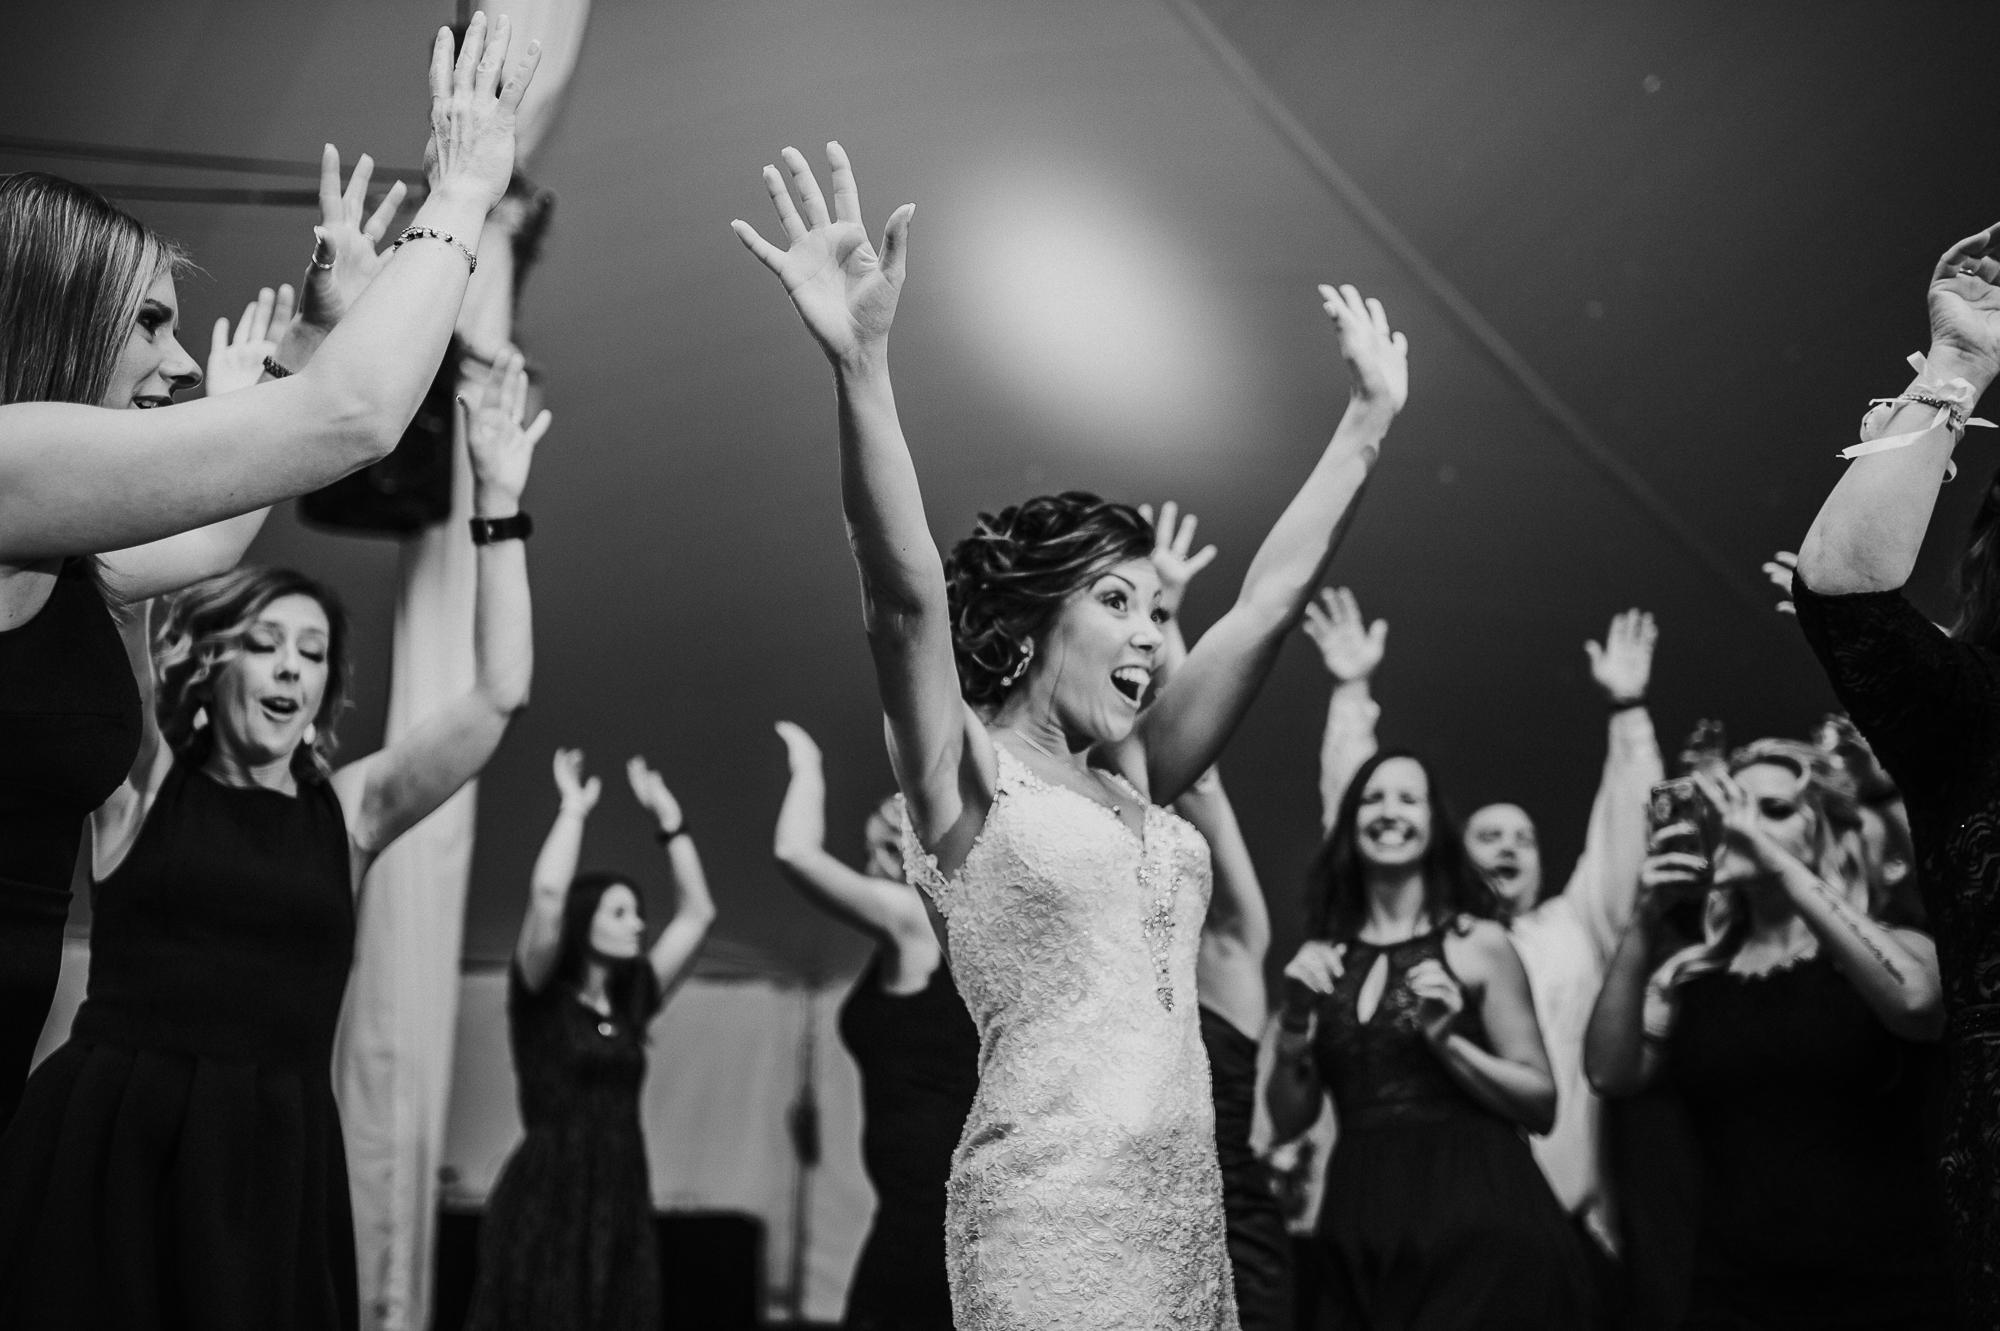 Christina-and-Gene-Wedding-Marla-Rain-Photography-626.jpg